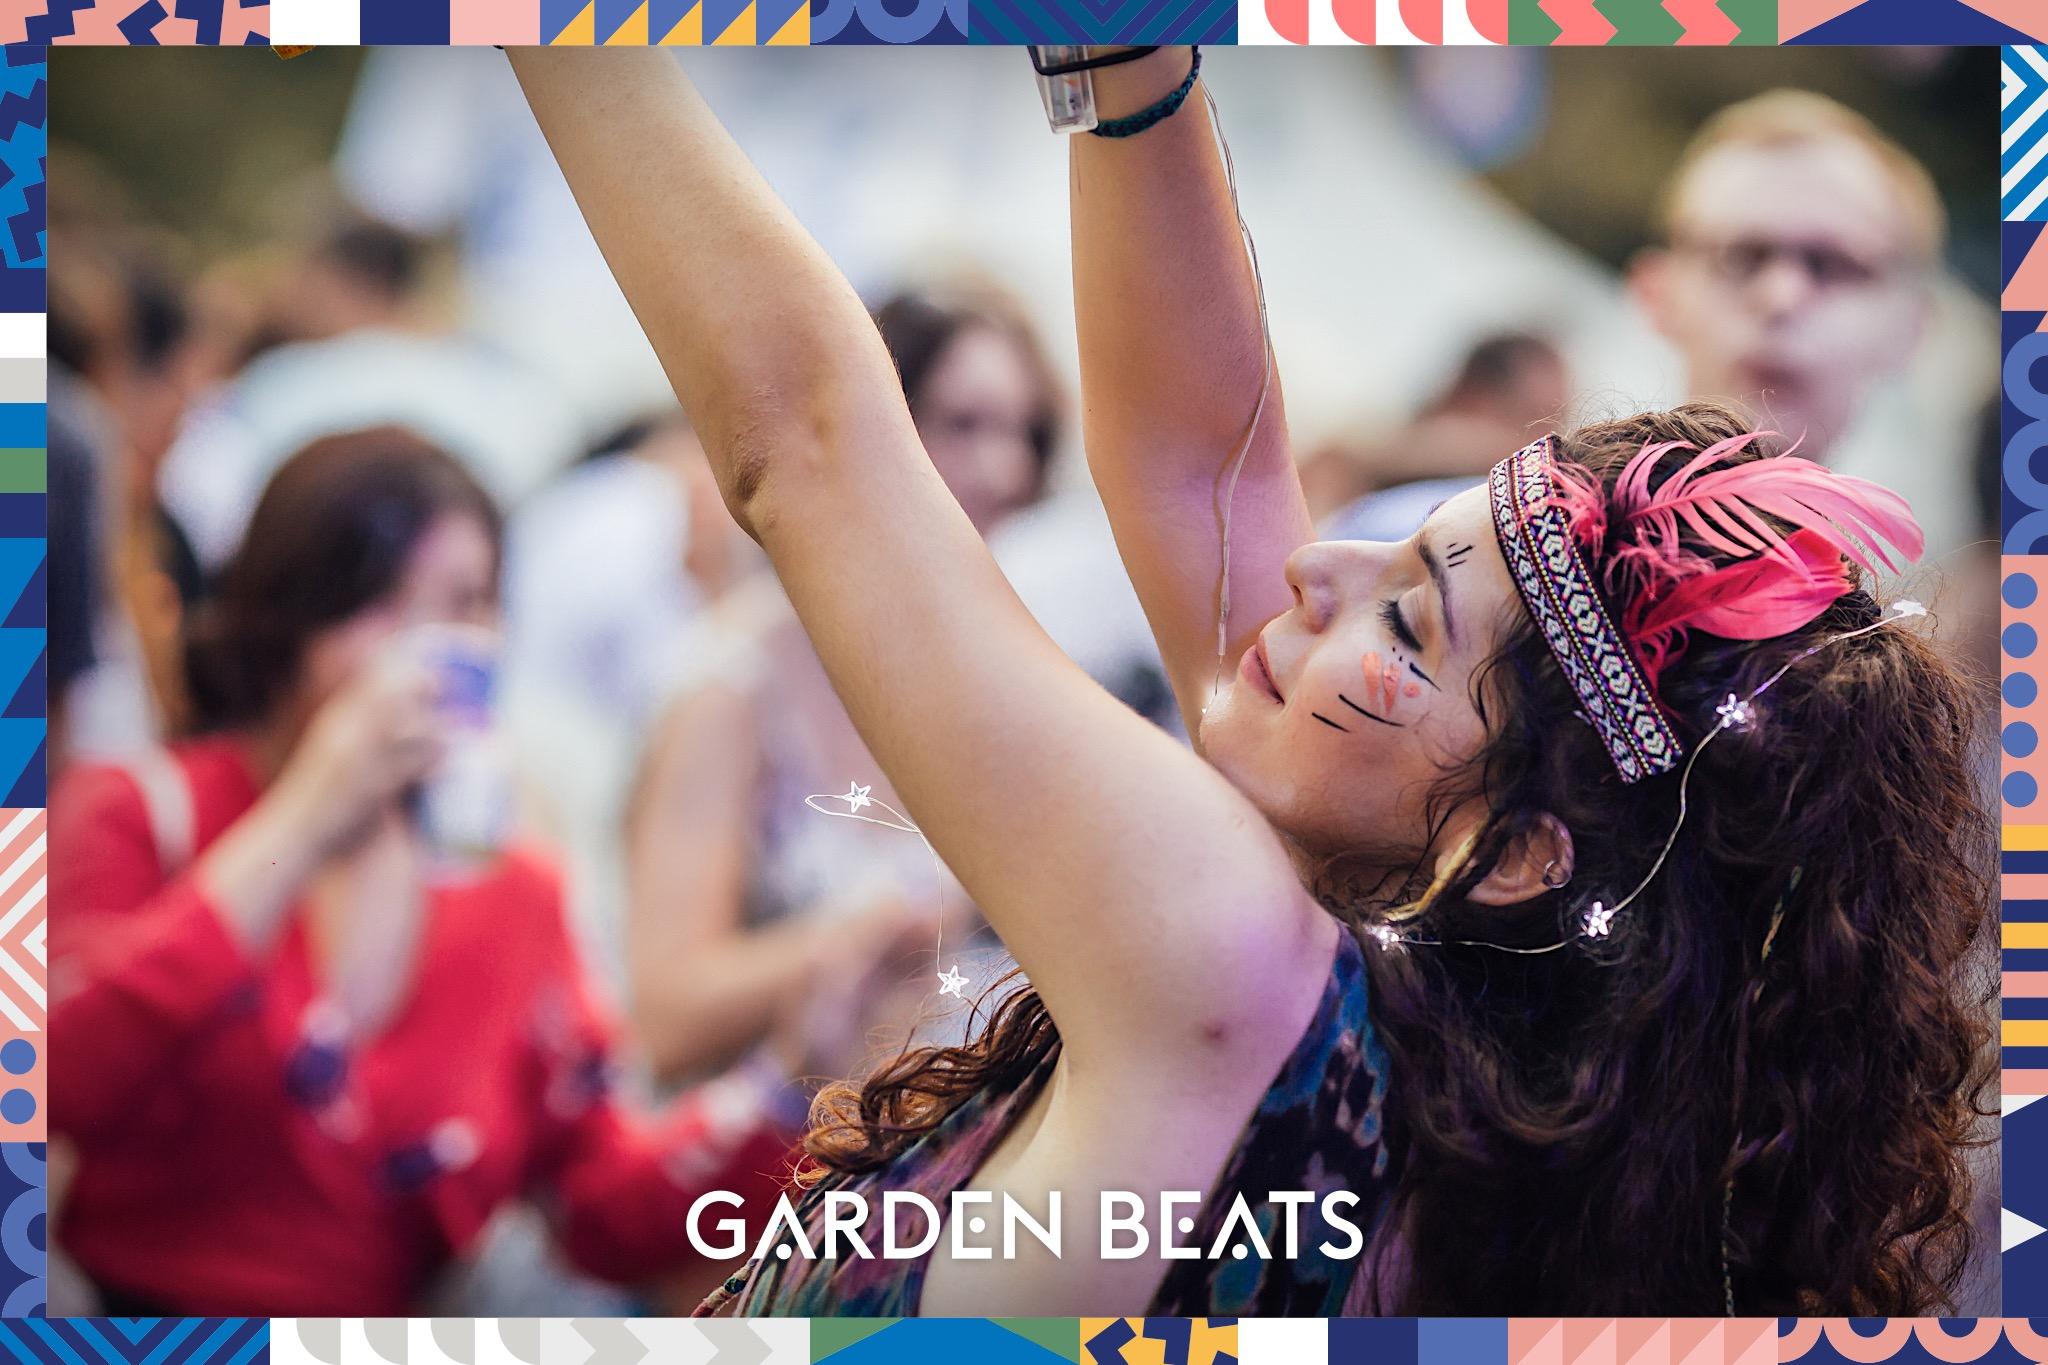 18032017_GardenBeats_Colossal593_WatermarkedGB.jpg